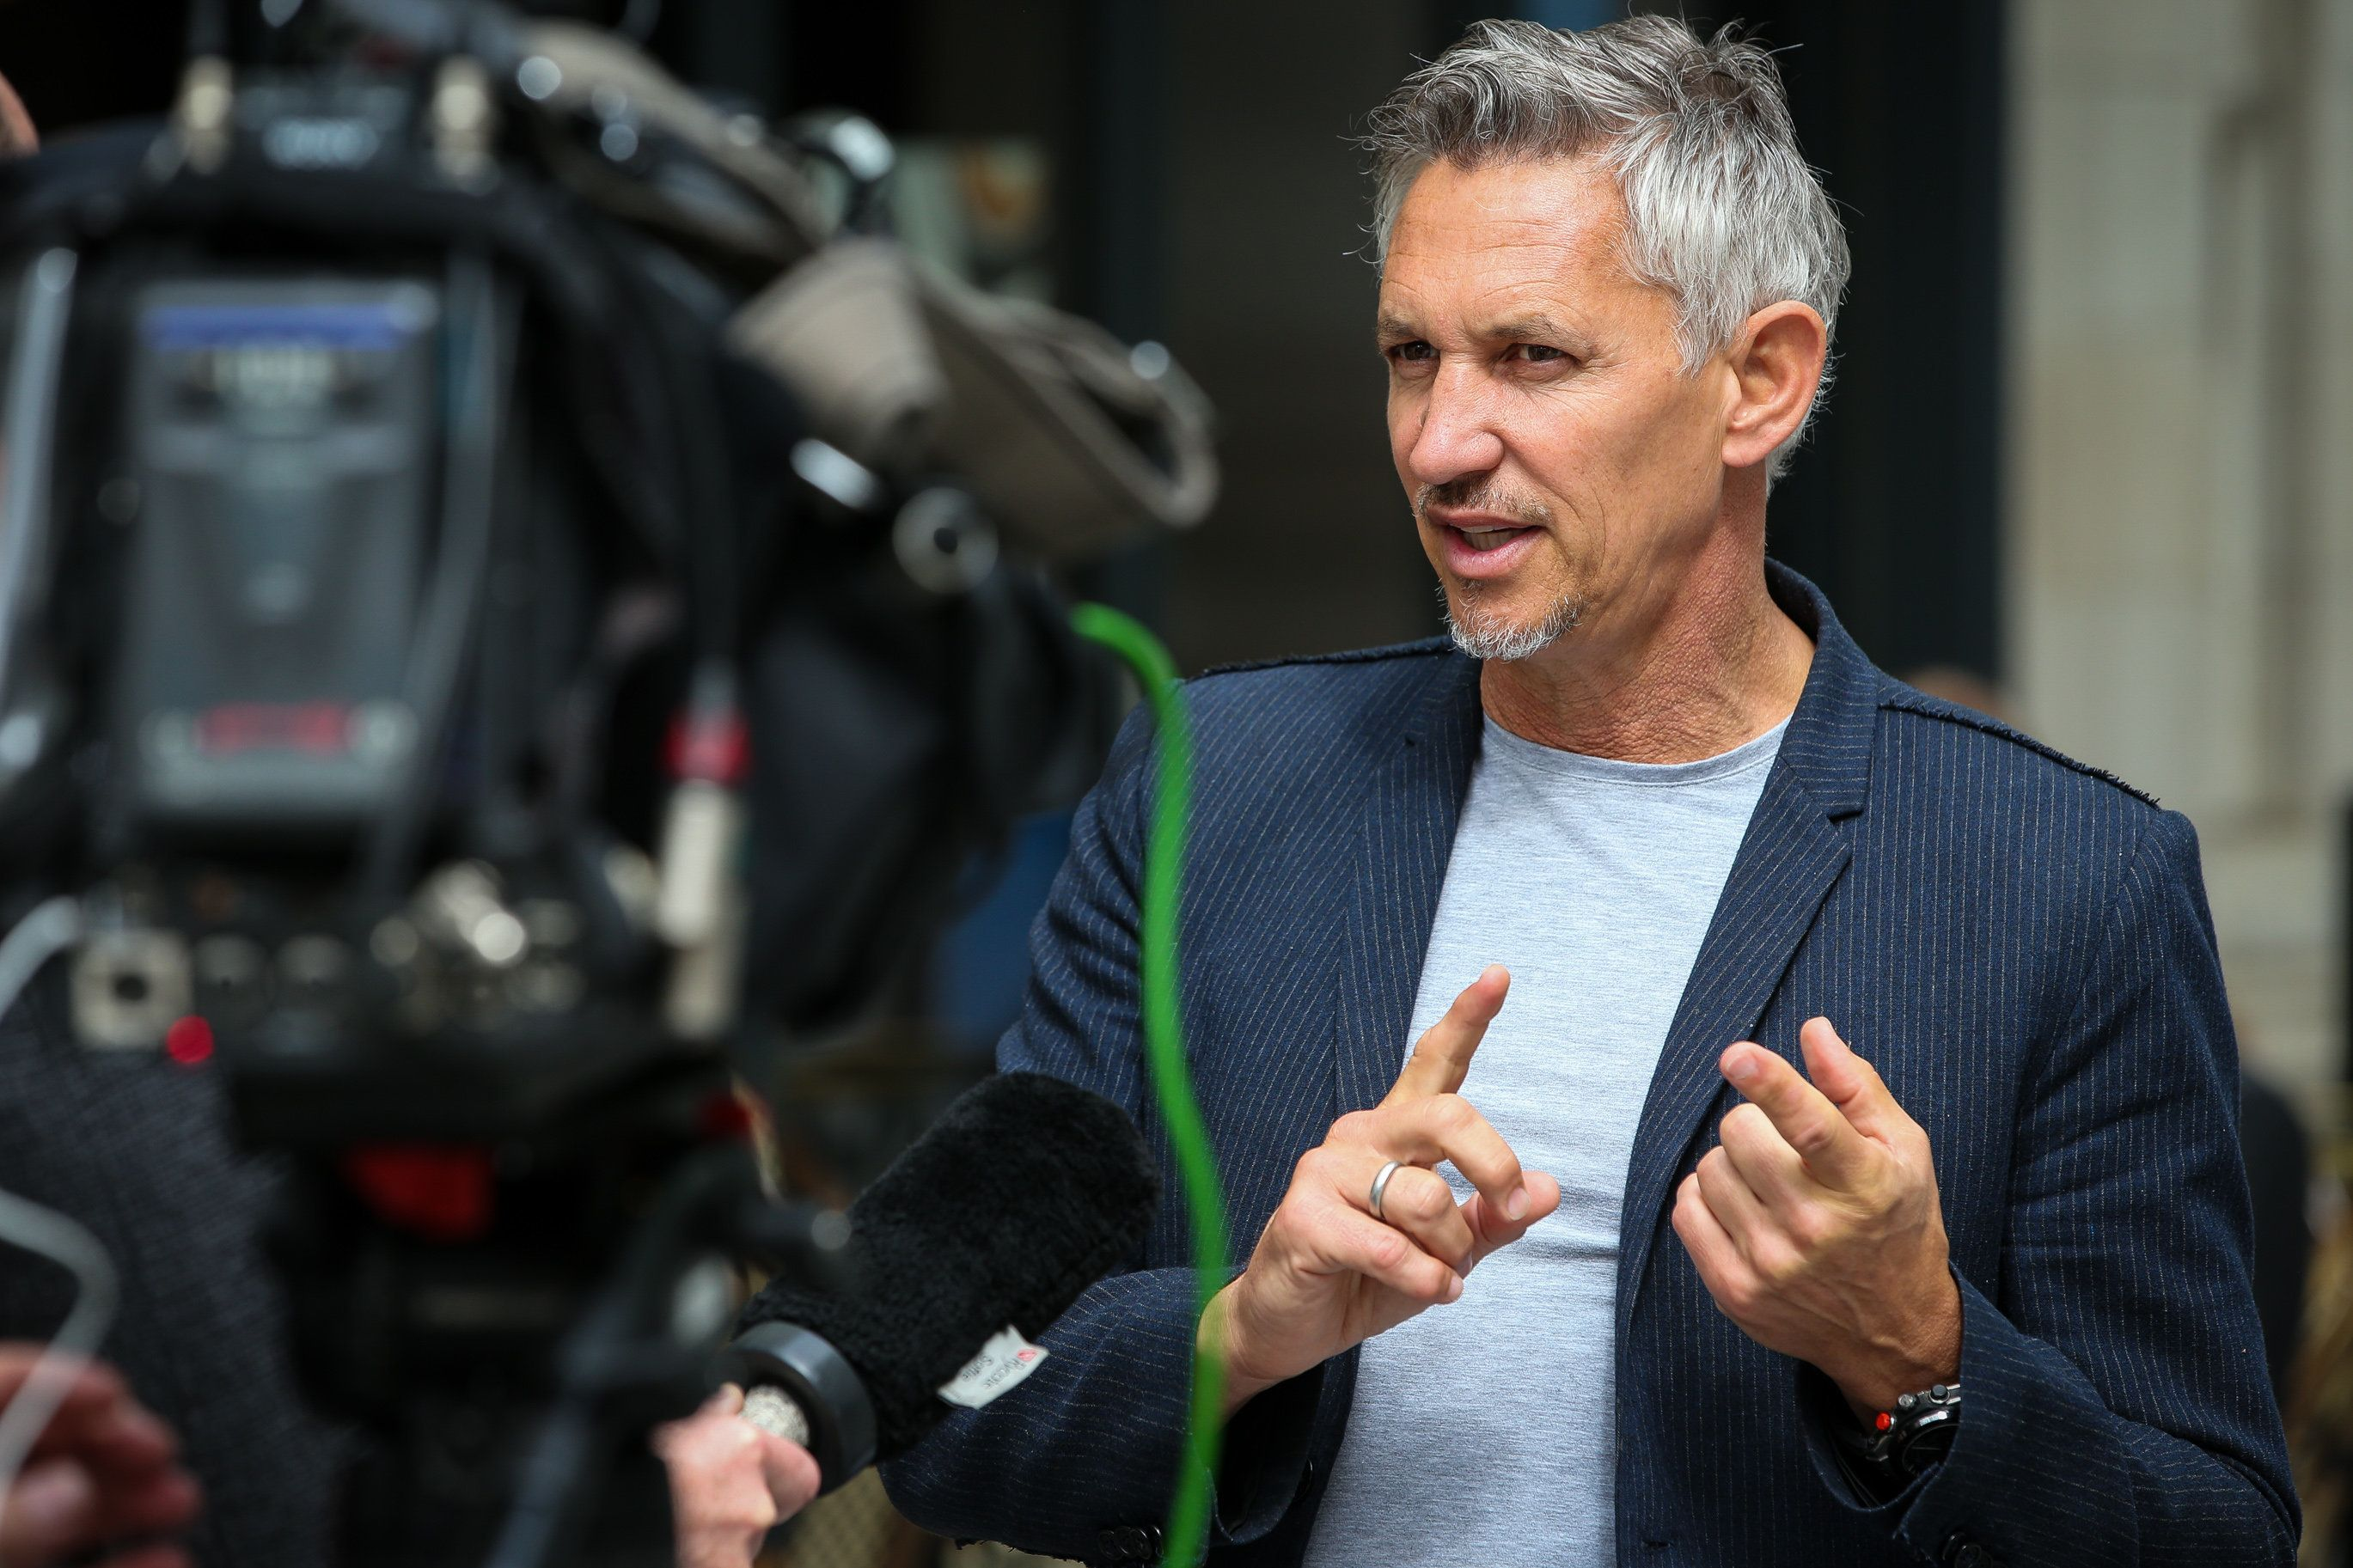 'Bollocks, Bollocks': Gary Lineker's Agent Hits Back At Fresh BBC Sexism